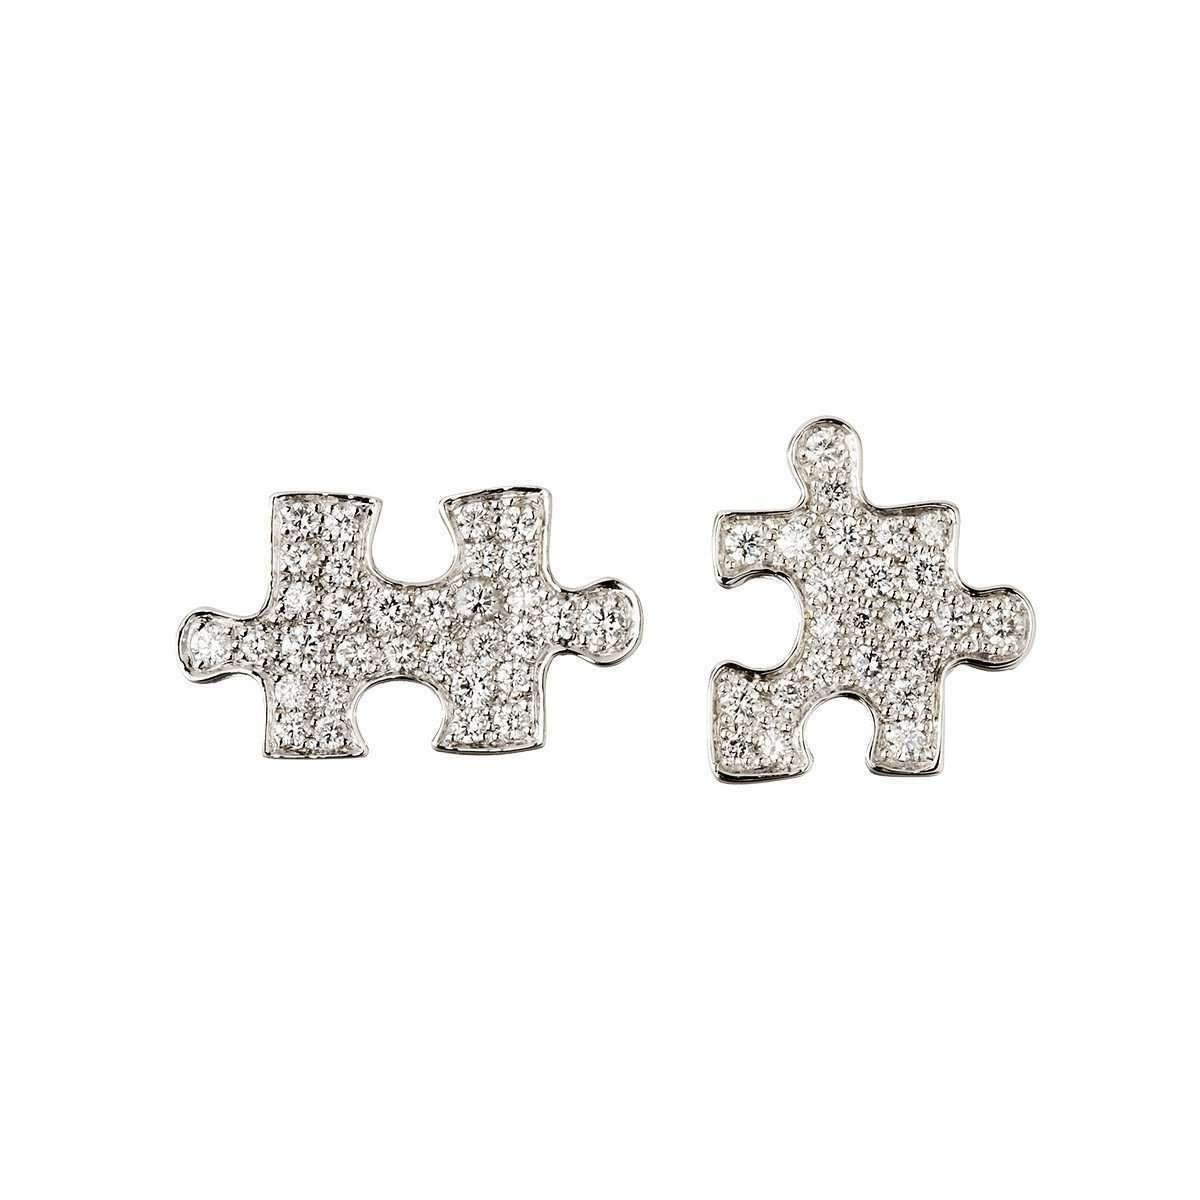 Akillis Puzzle White Gold With Diamonds Clip Earrings DorVN